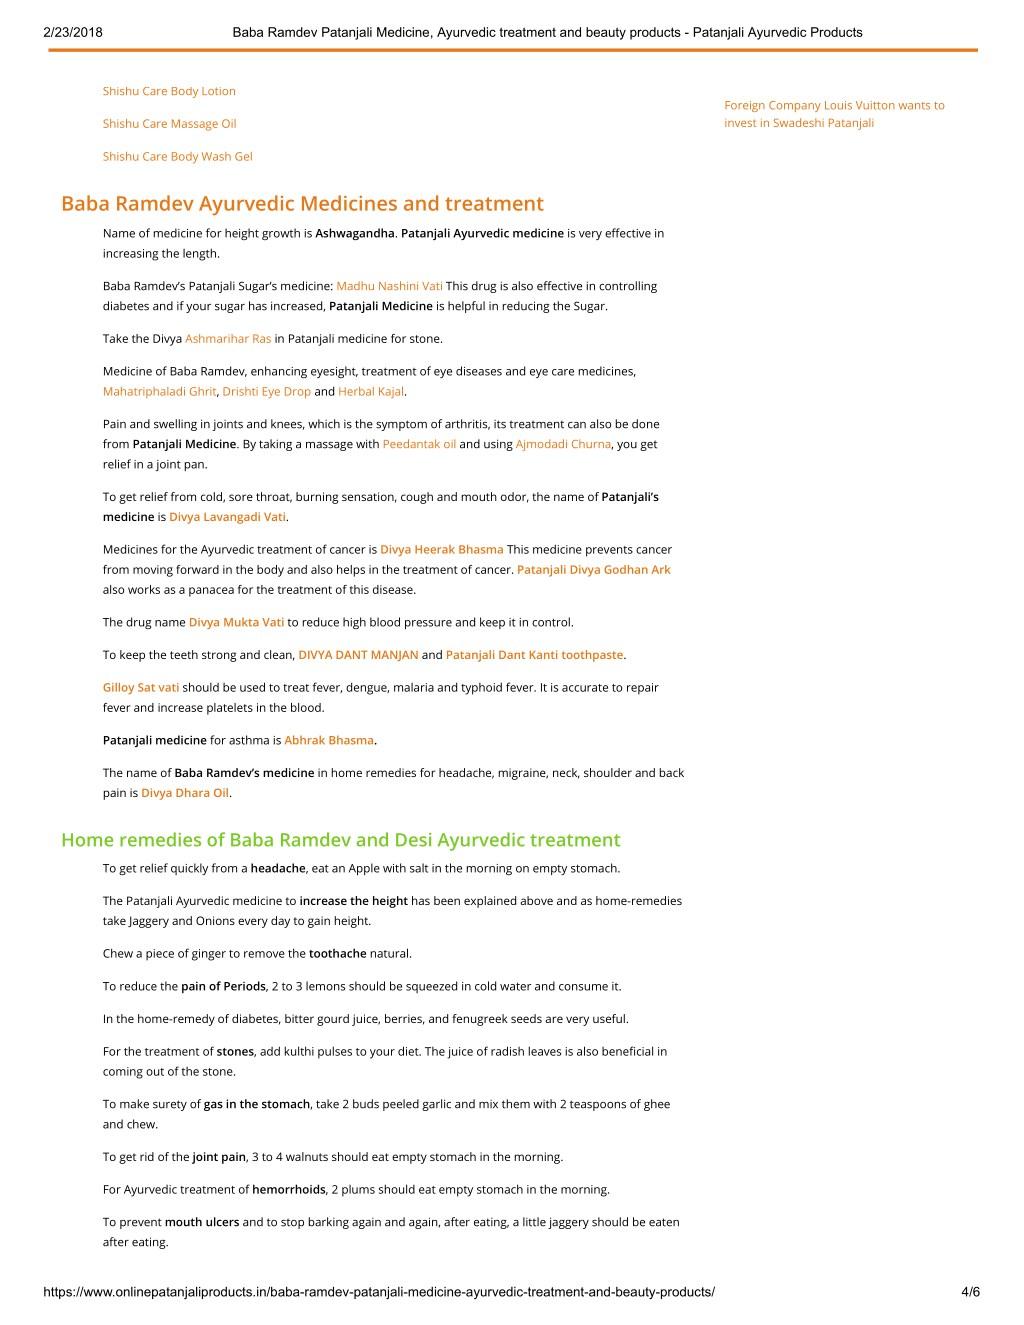 PPT - Baba Ramdev Patanjali Medicine, Ayurvedic treatment and beauty